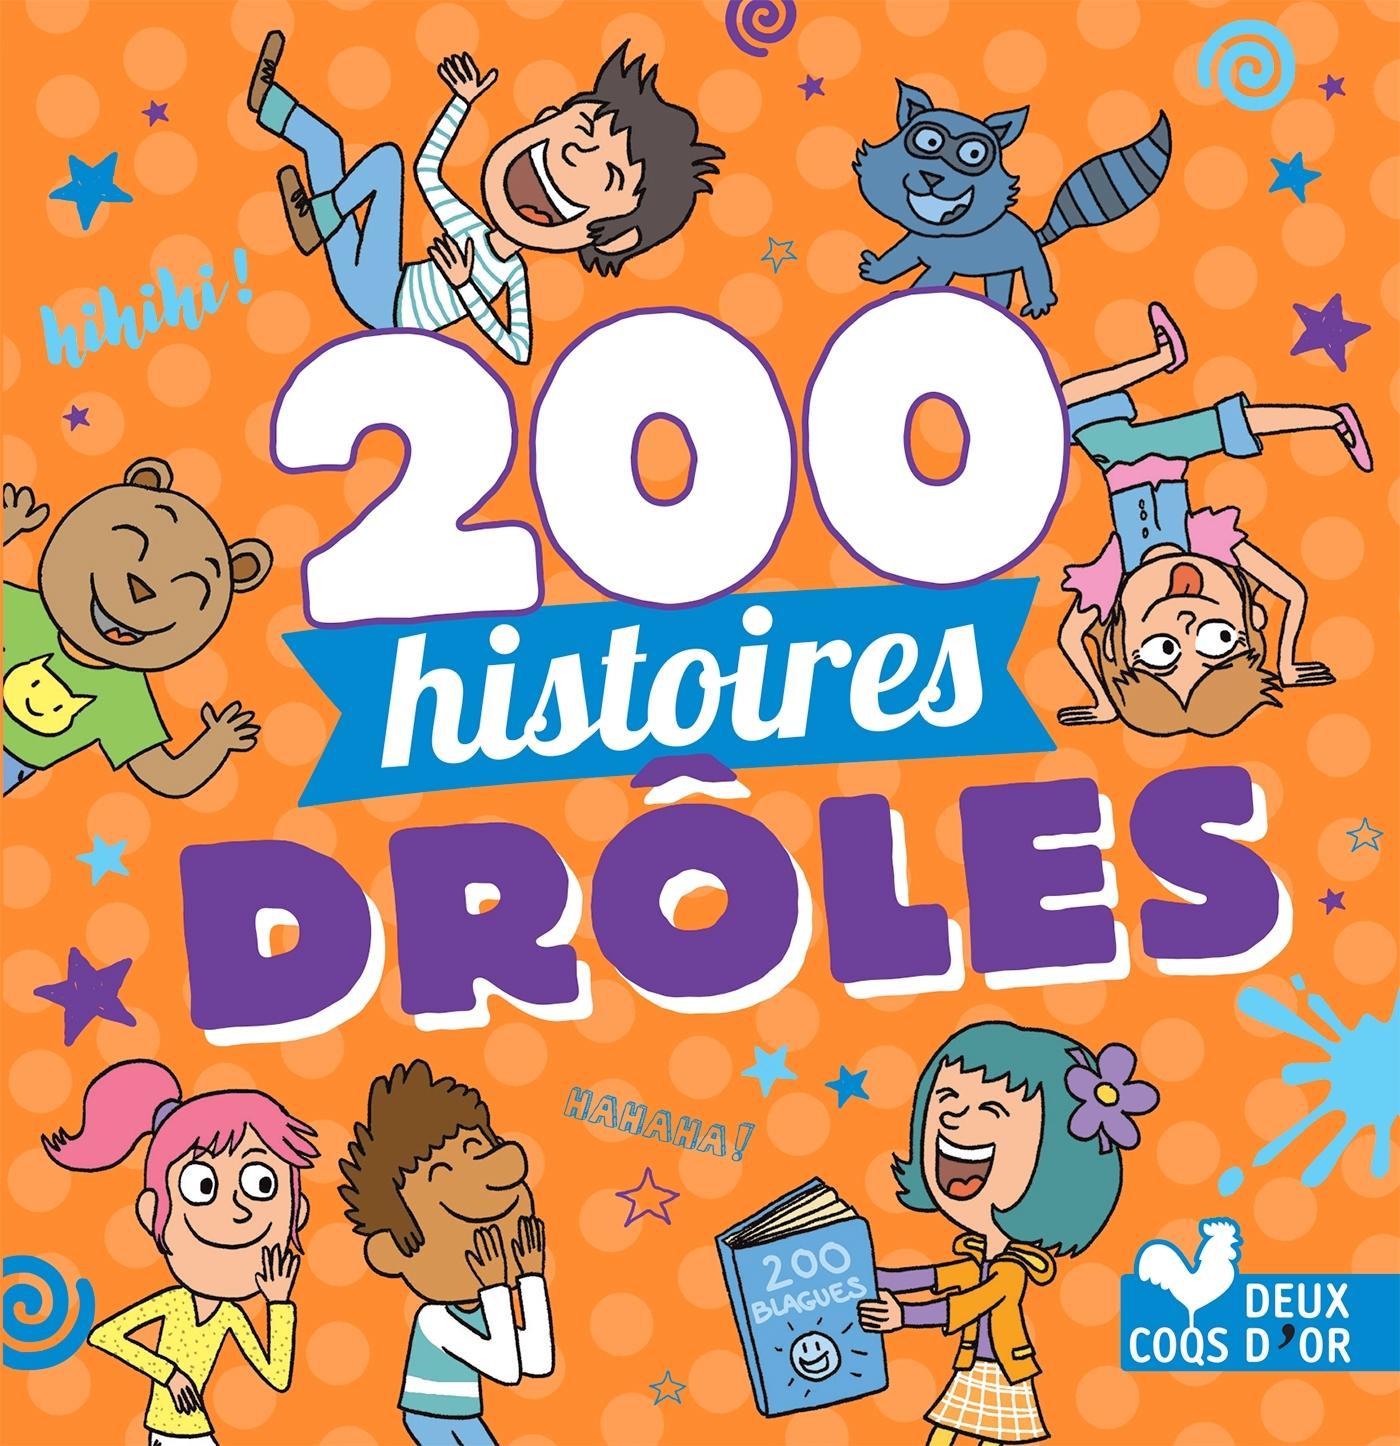 200 HISTOIRES DROLES